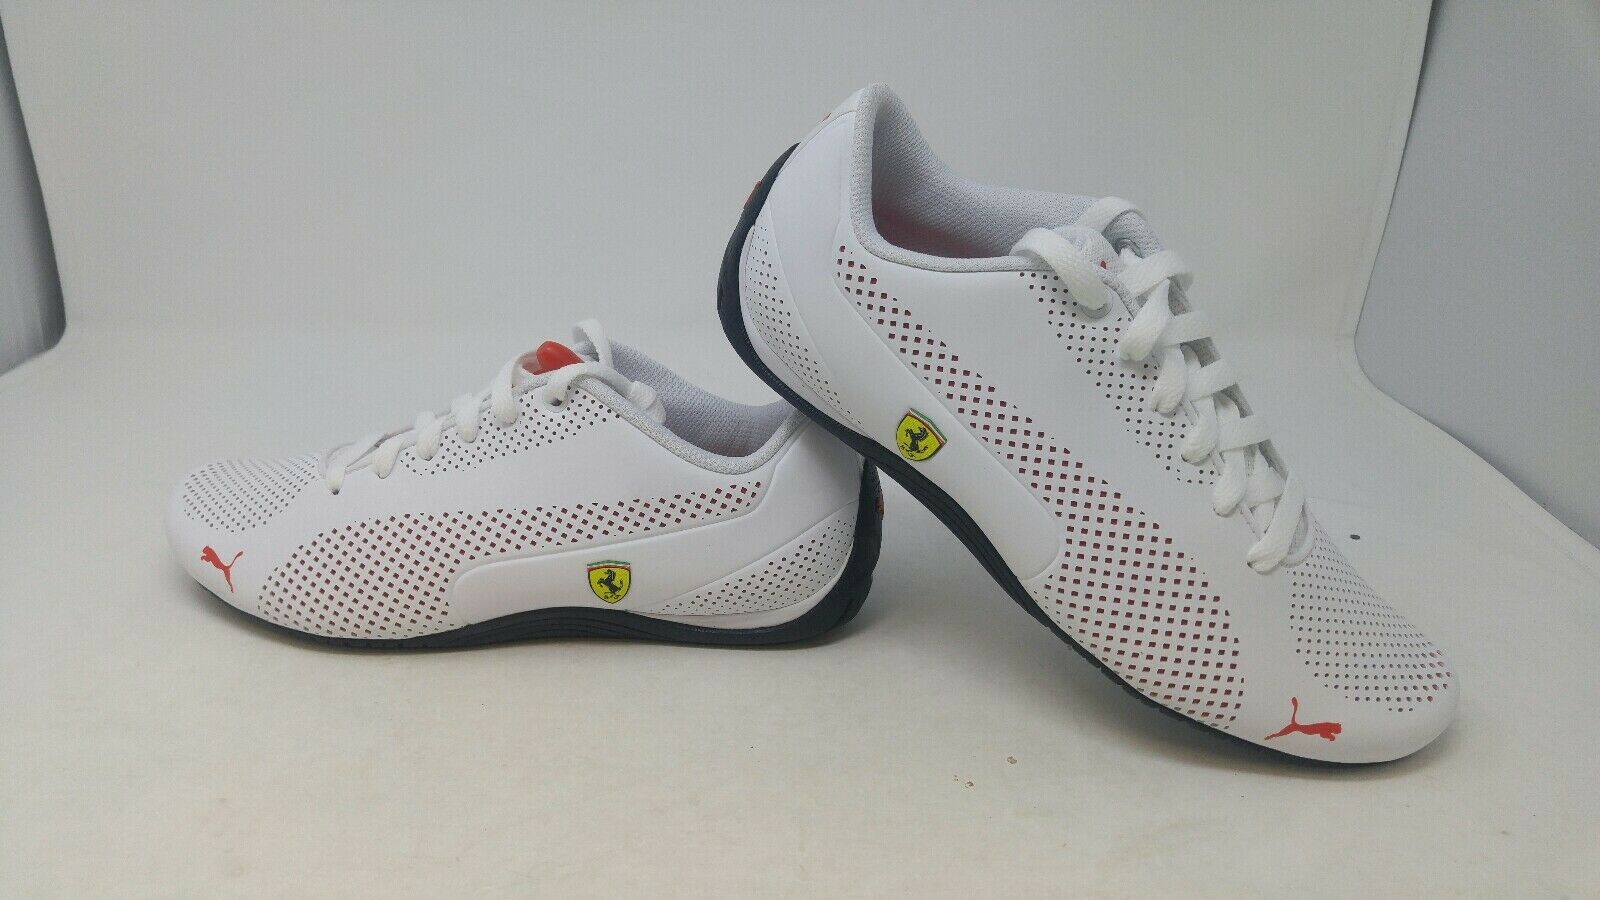 Puma Mens Athletic shoes White Size 8